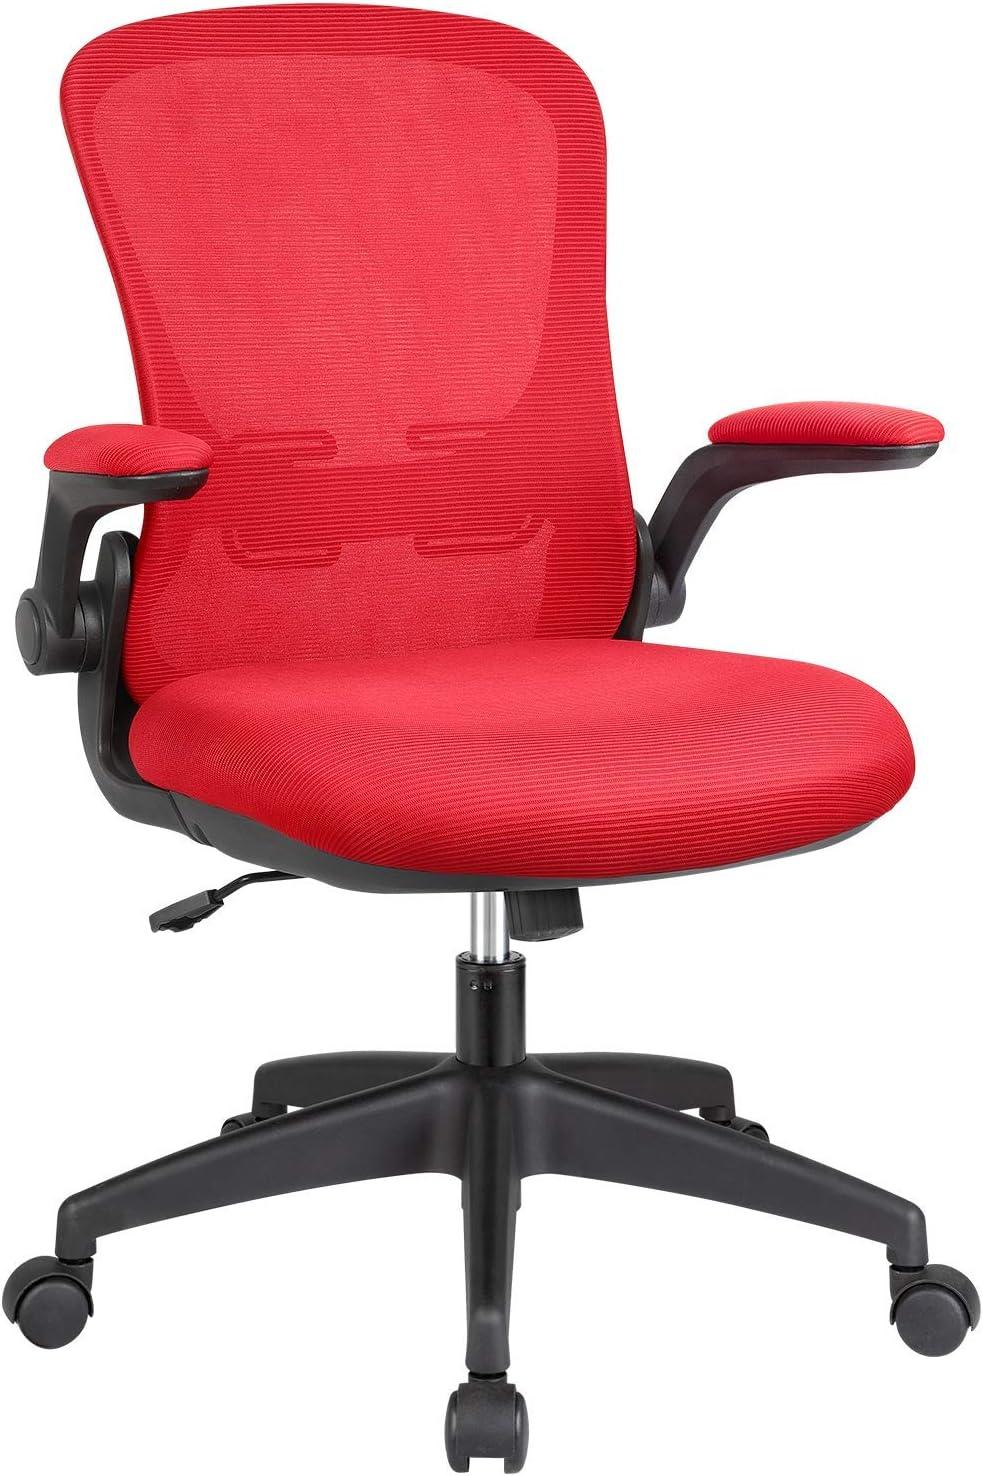 KaiMeng Office Computer Chair Ergonomic Desk Chair Mesh Task Chair Flip-up Arms Modern Executive Lumbar Support, Adjustable High Back Swivel Chair (Red)